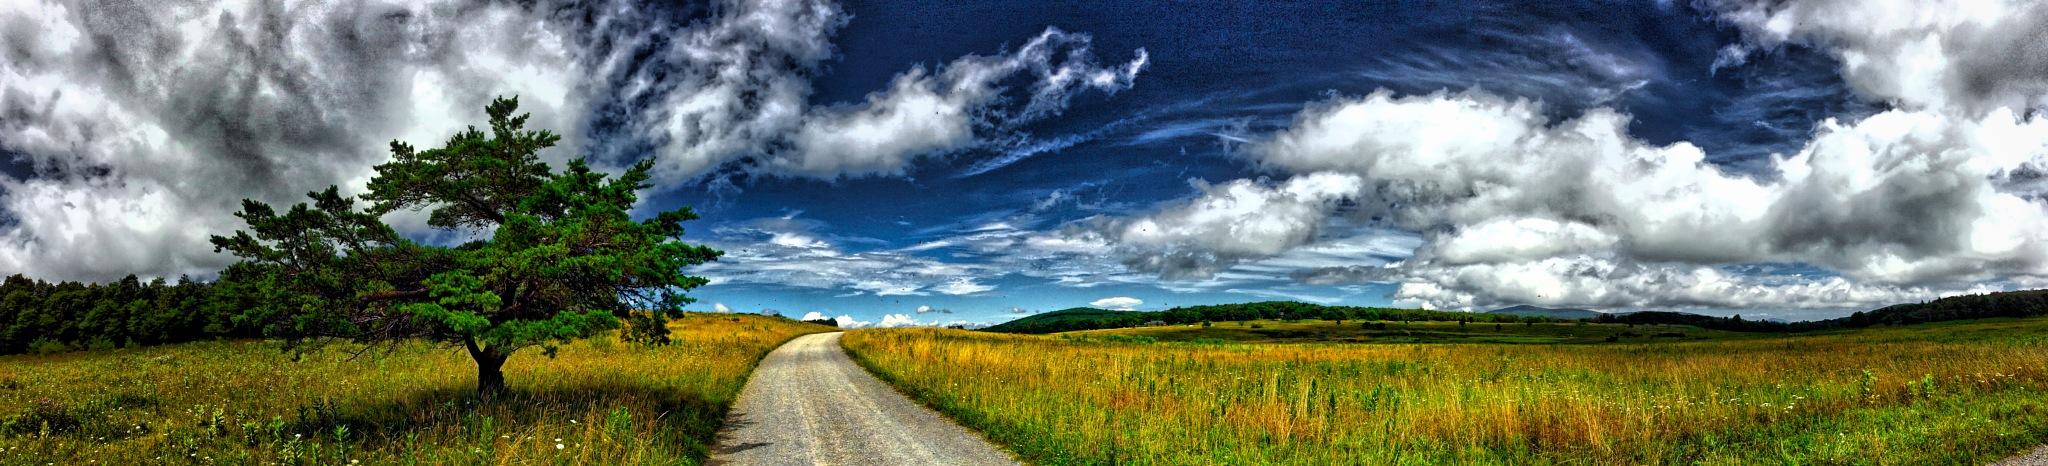 """Mountain Meadow"" by Michael  C. Habina"